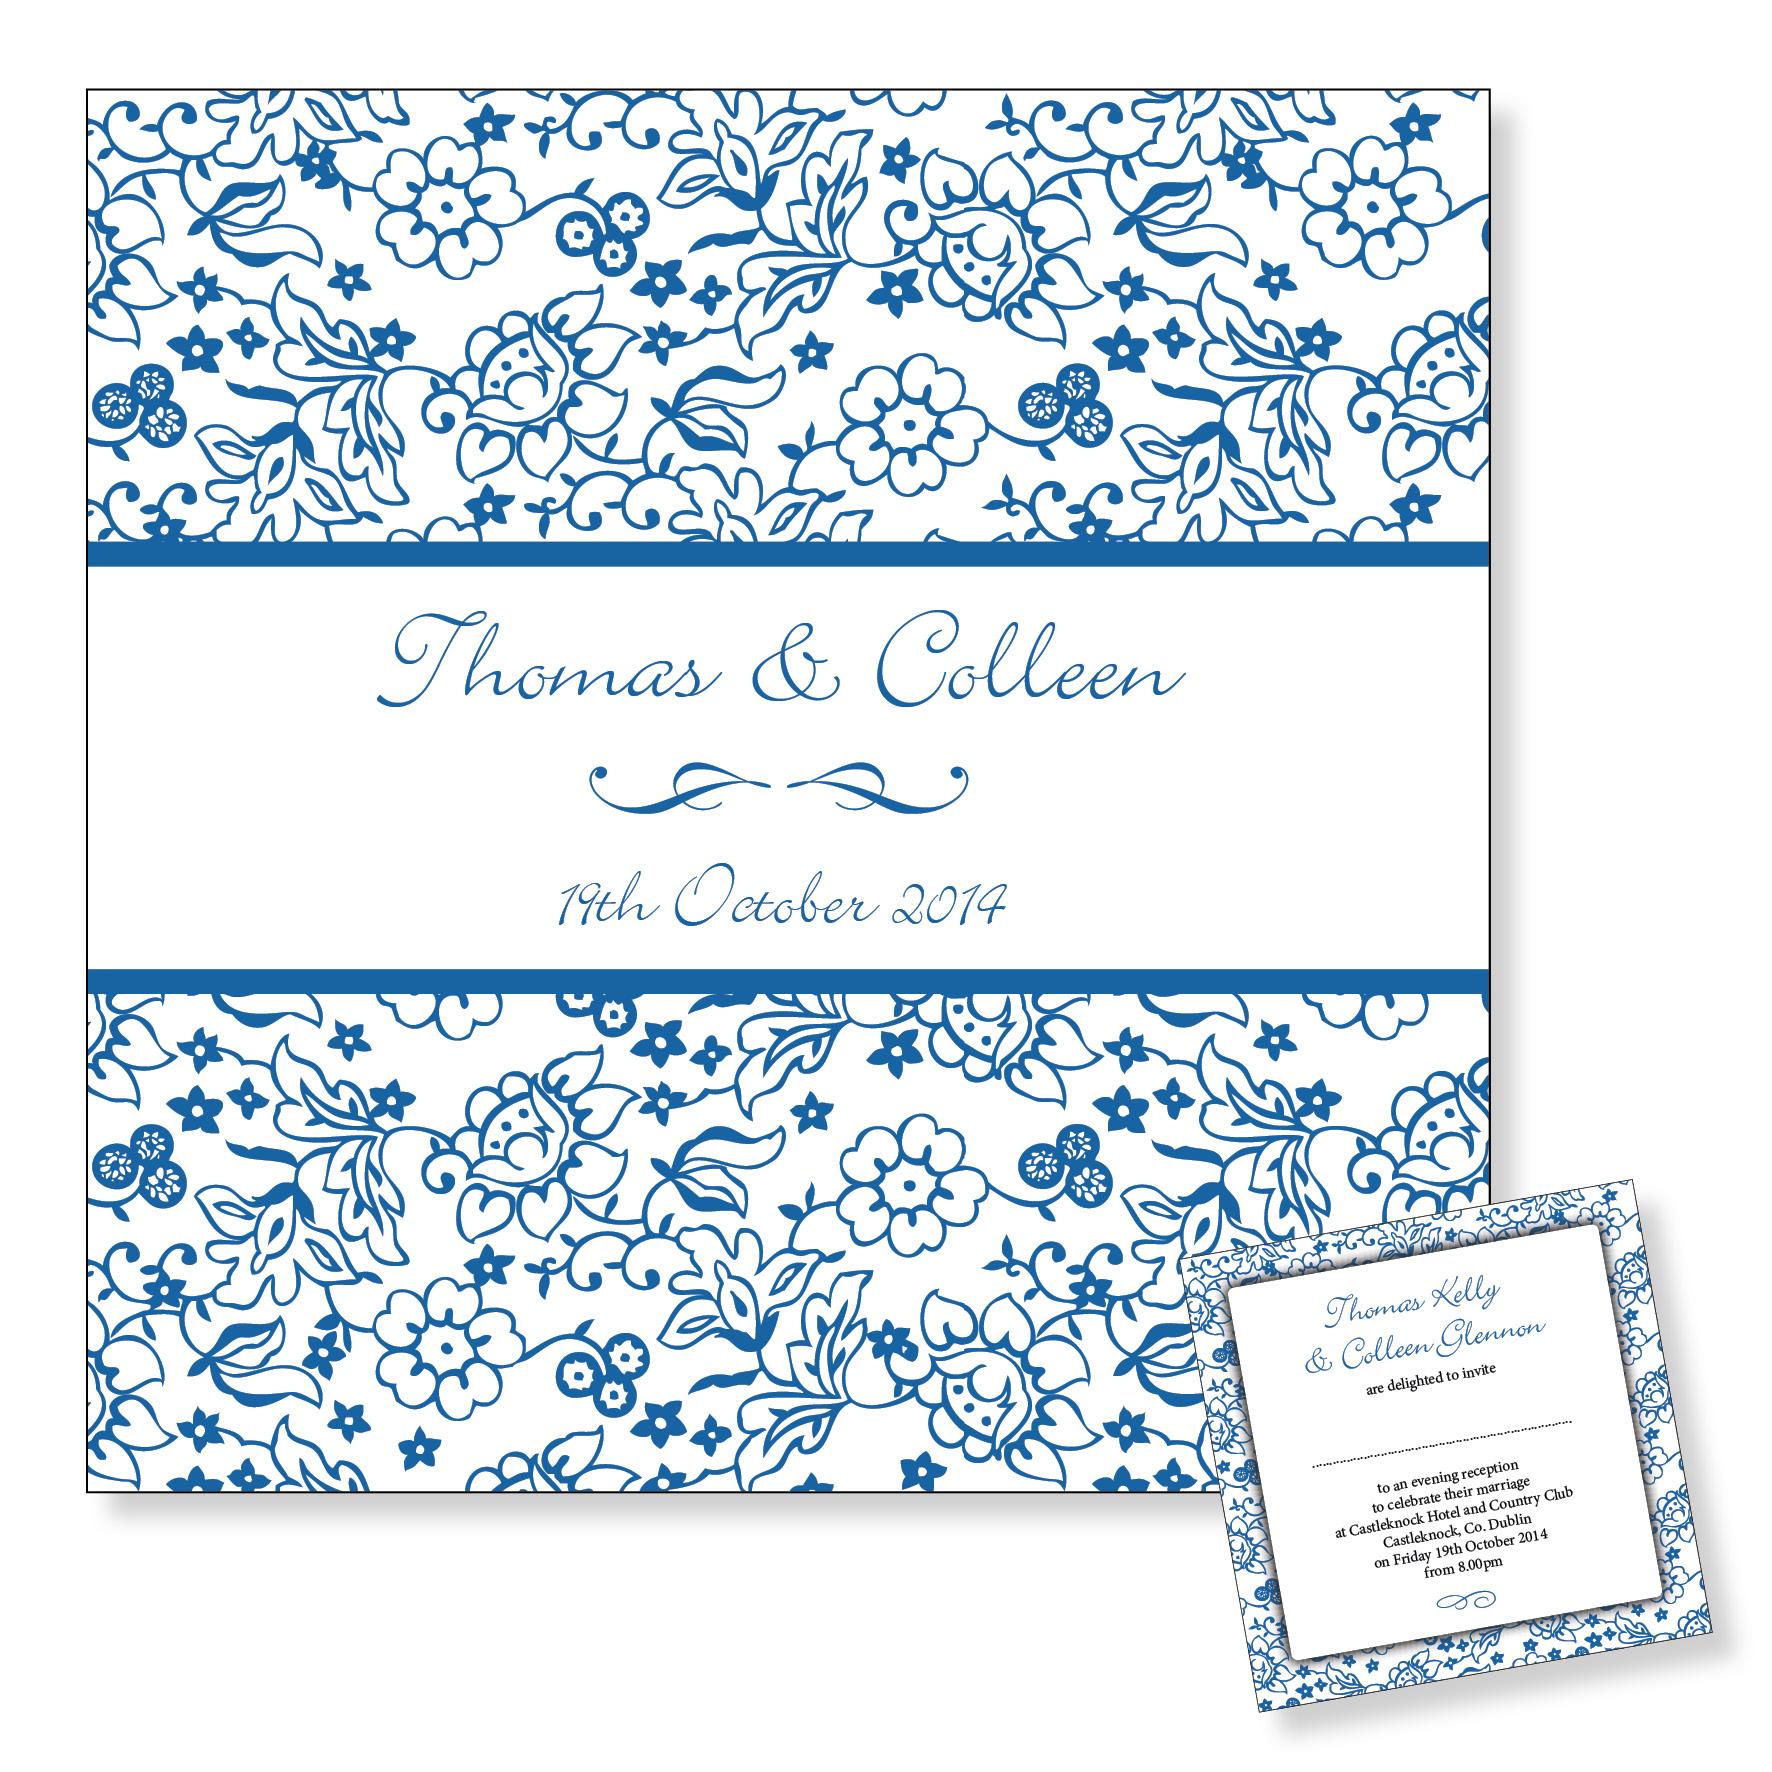 Evening wedding invitation - Blue floral